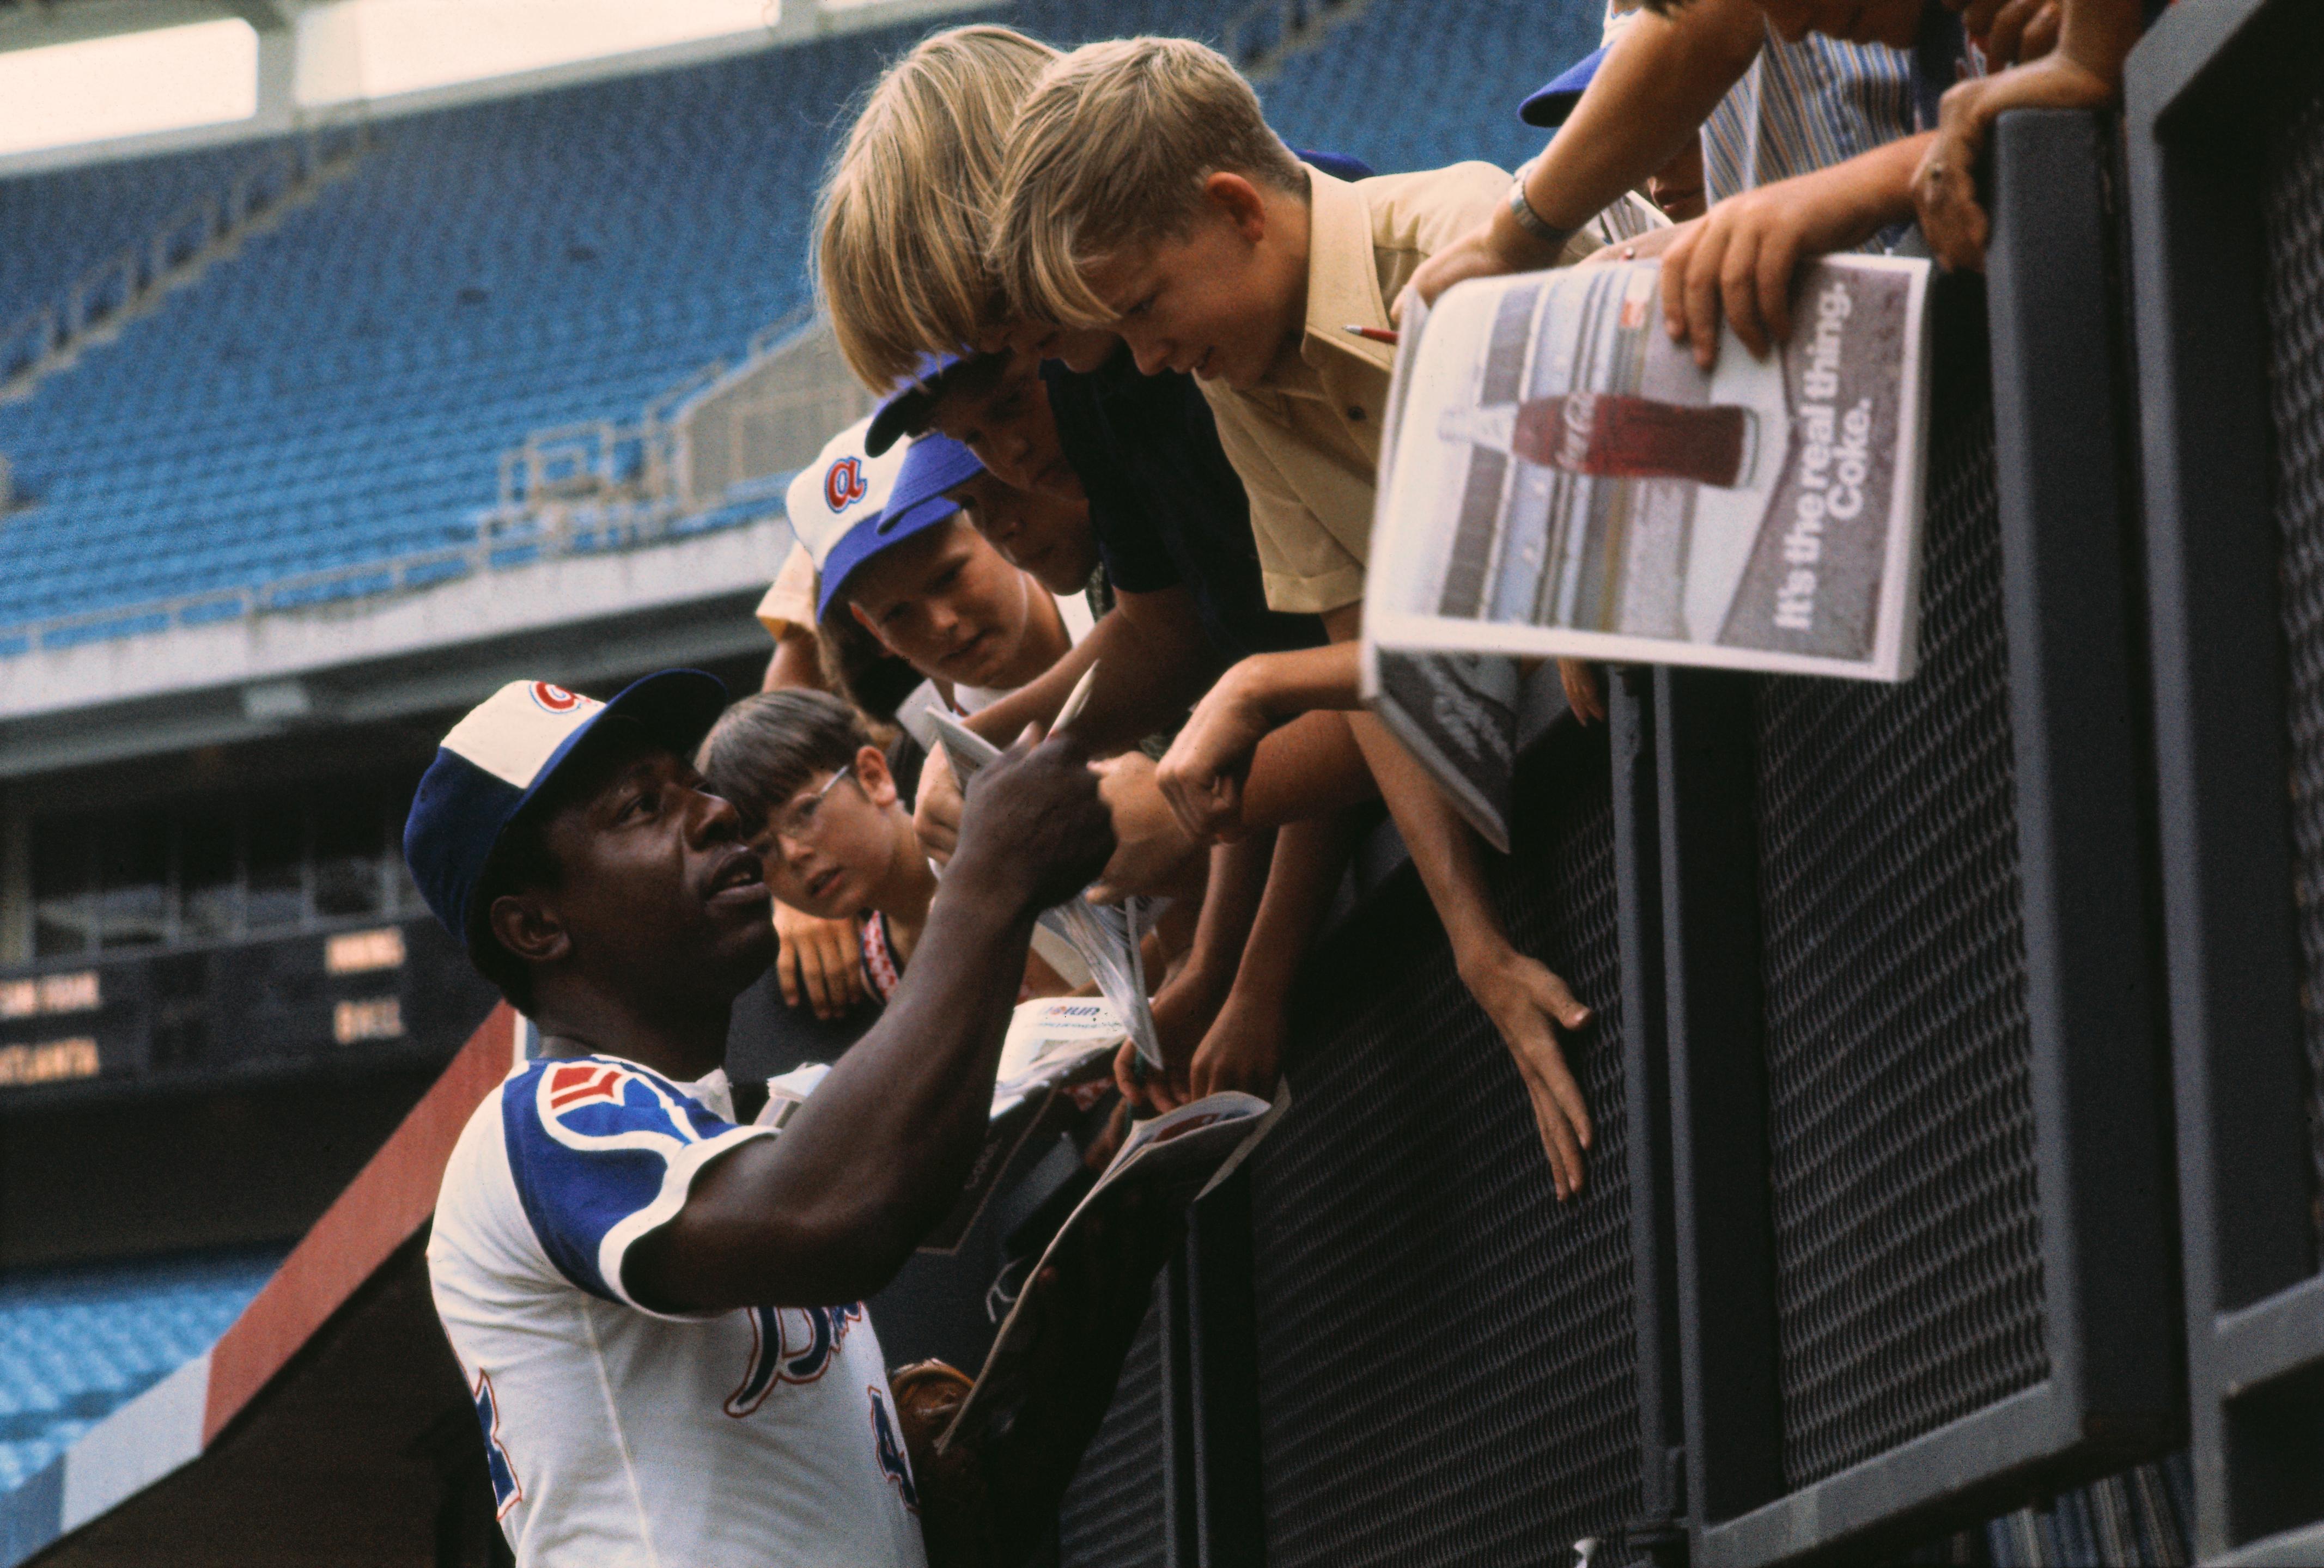 Hank Aaron Signing Autographs for Children in Stadium